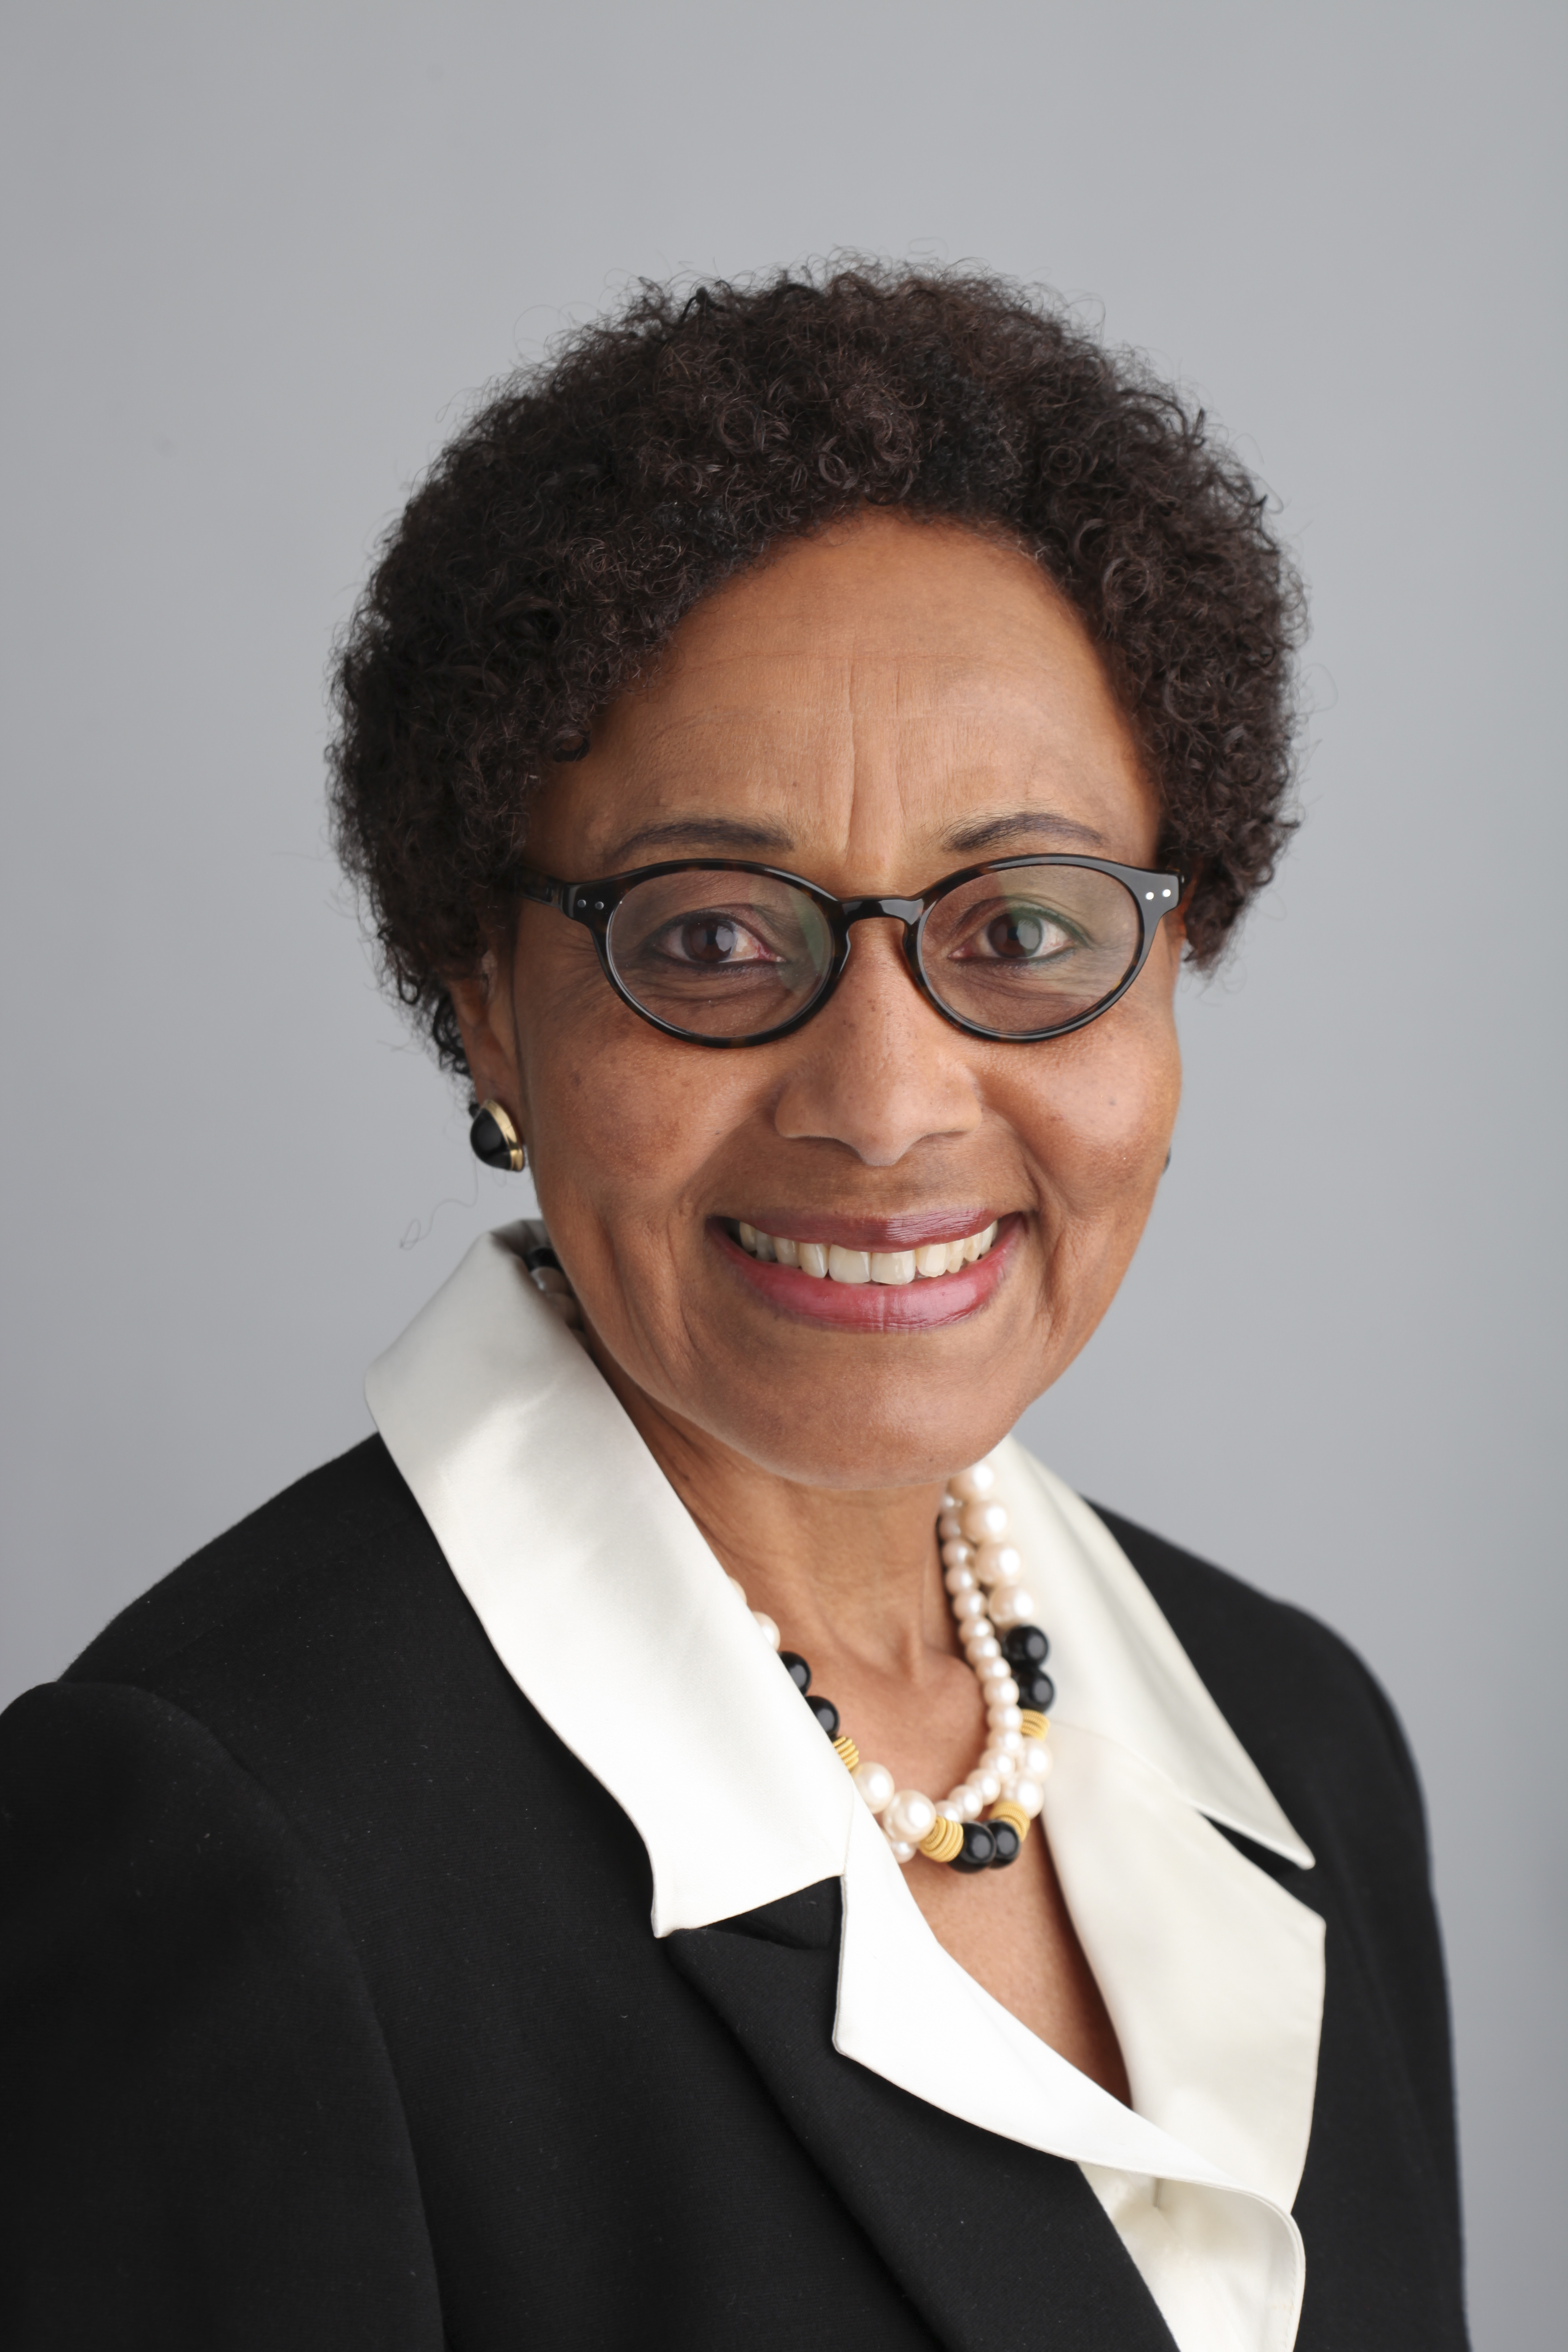 AdvancePierre™ Foods Appoints Celeste Clark to Board of Directors